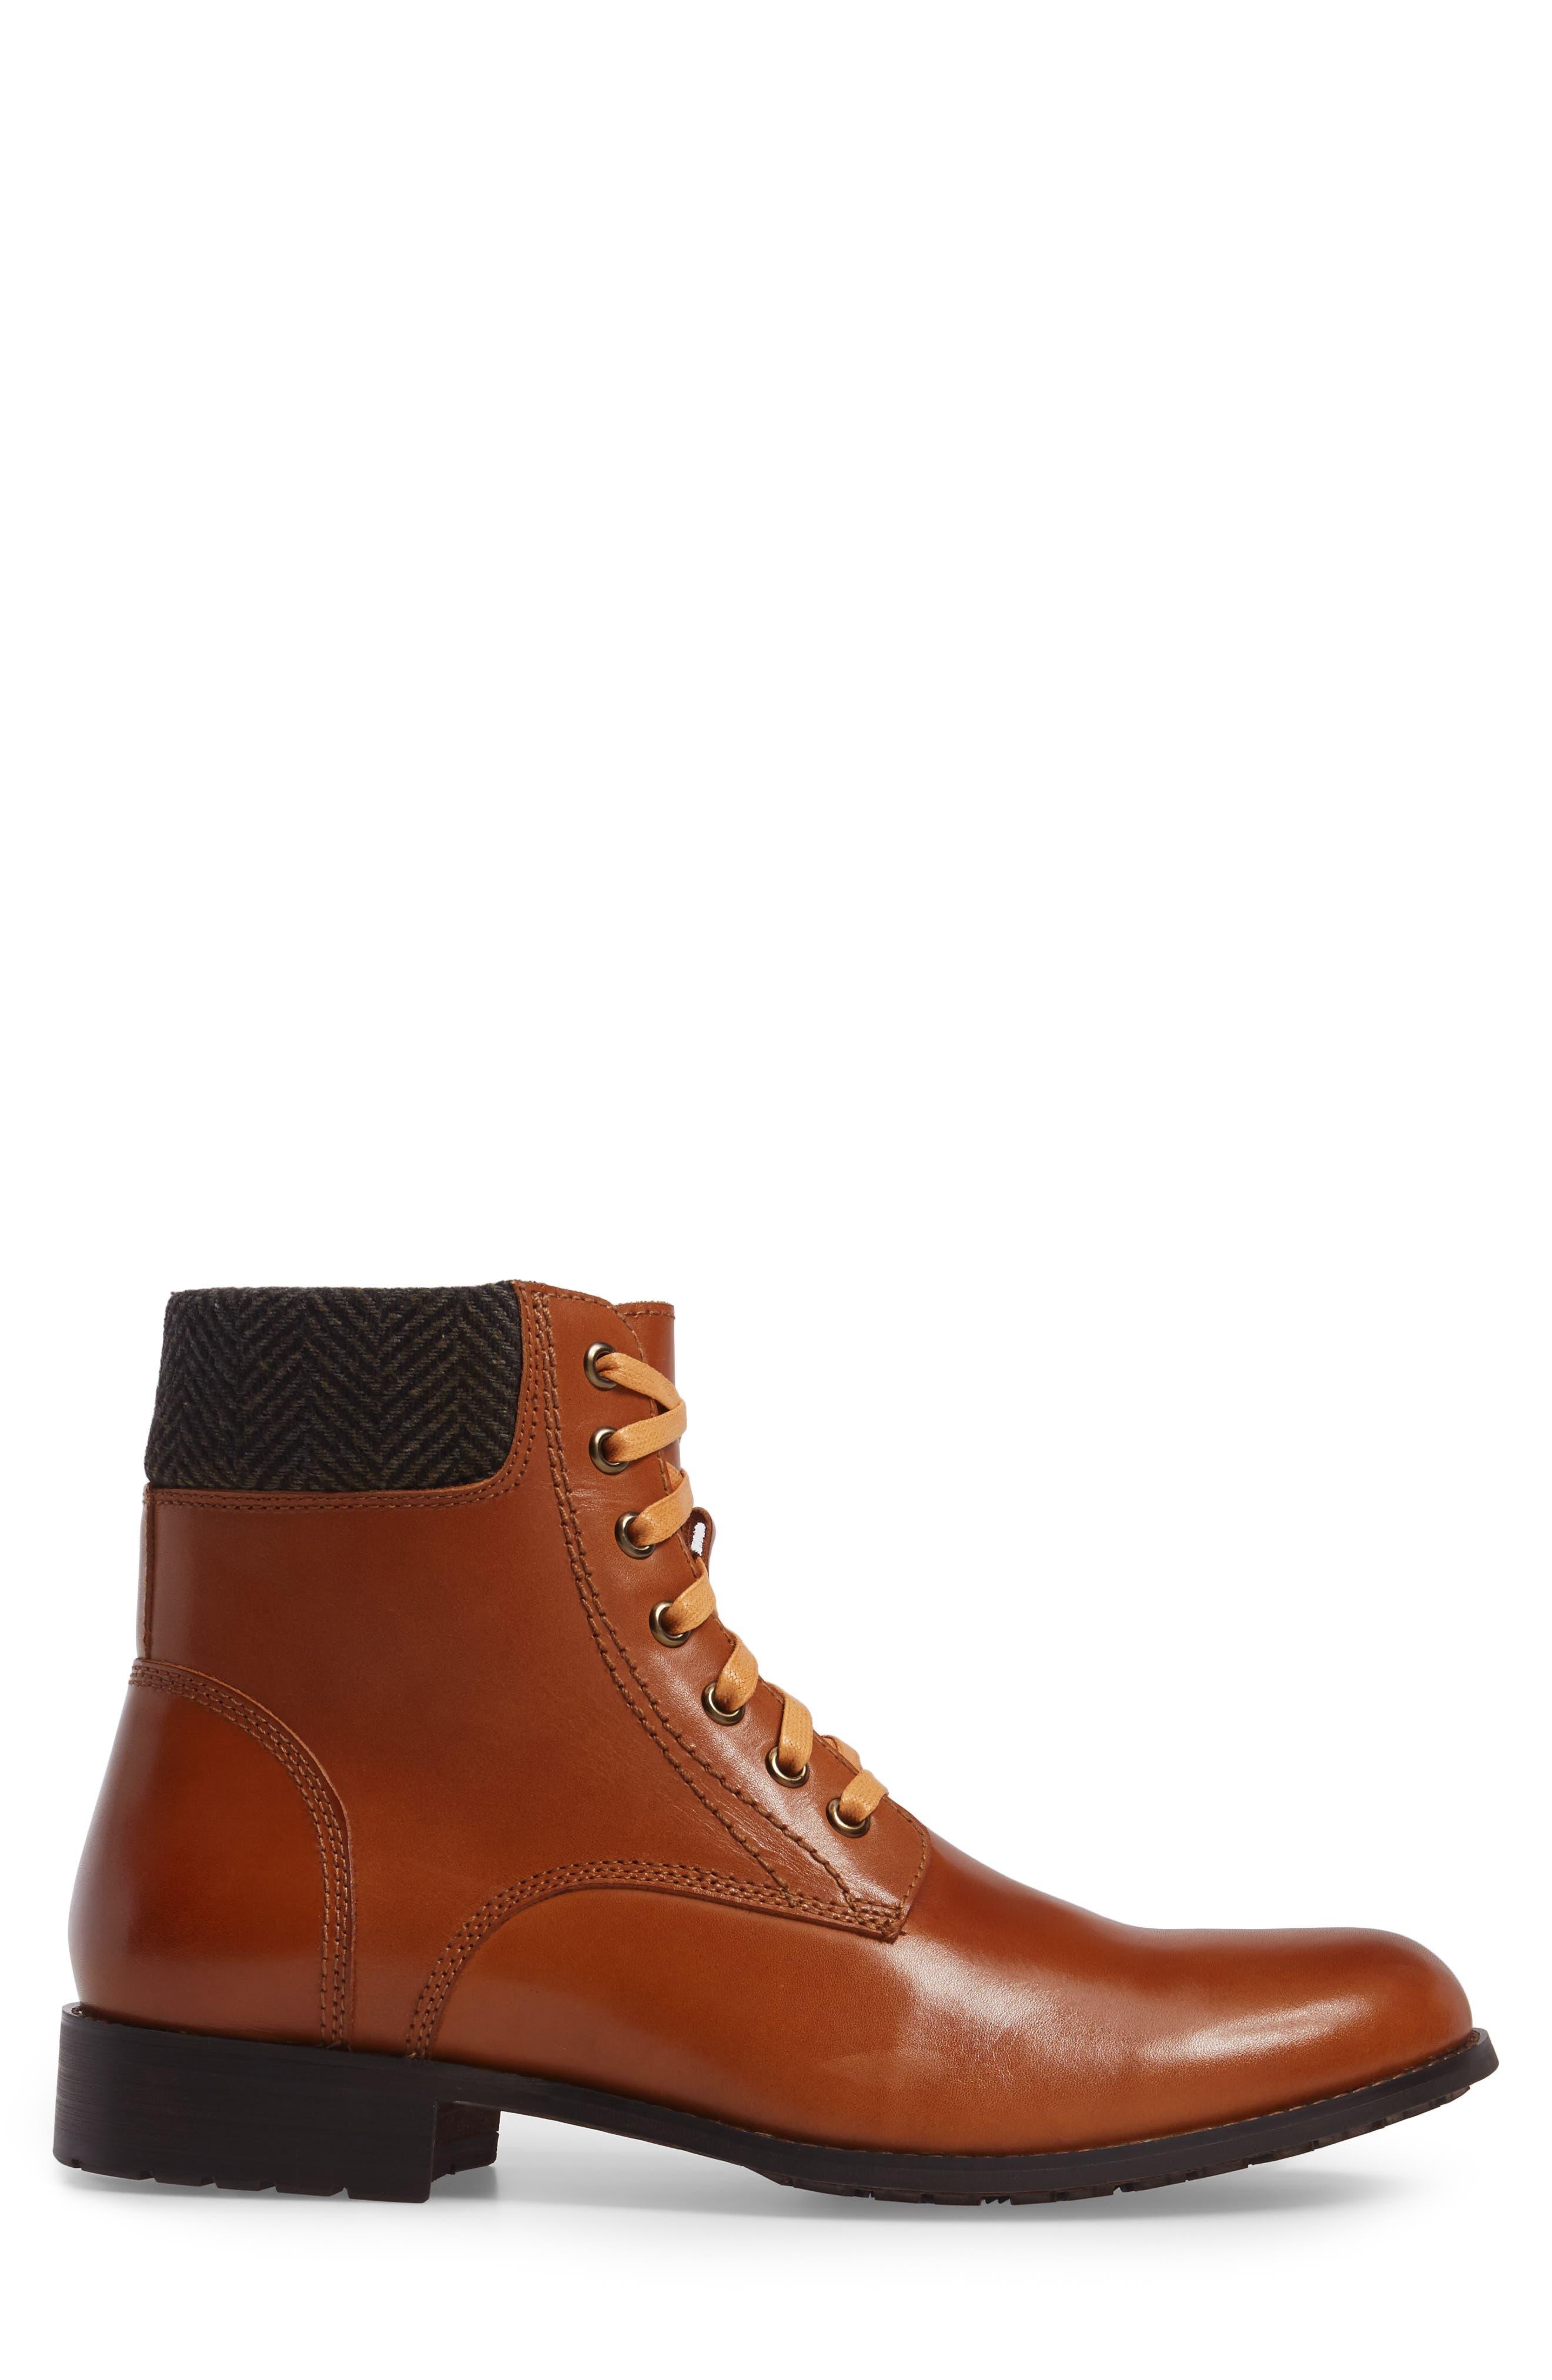 Saar Plain Toe Boot,                             Alternate thumbnail 9, color,